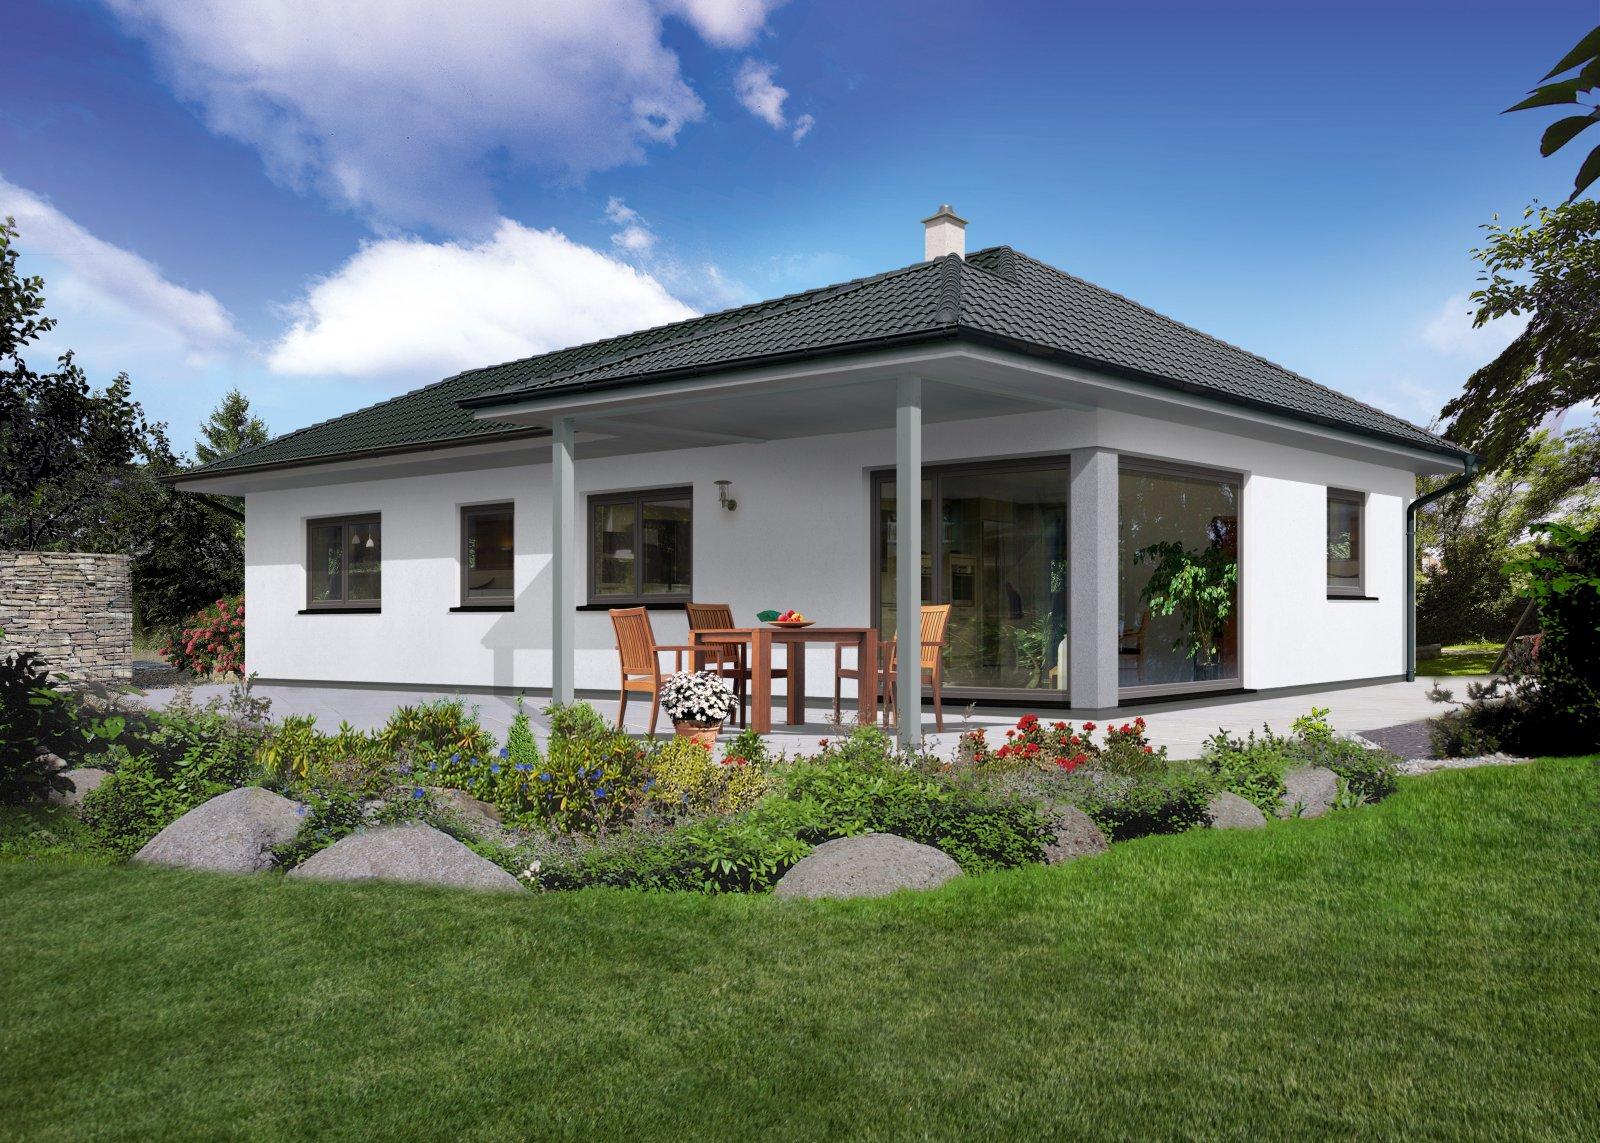 Trend 100 W - Panoramaverglasung und Terrassenüberdachung